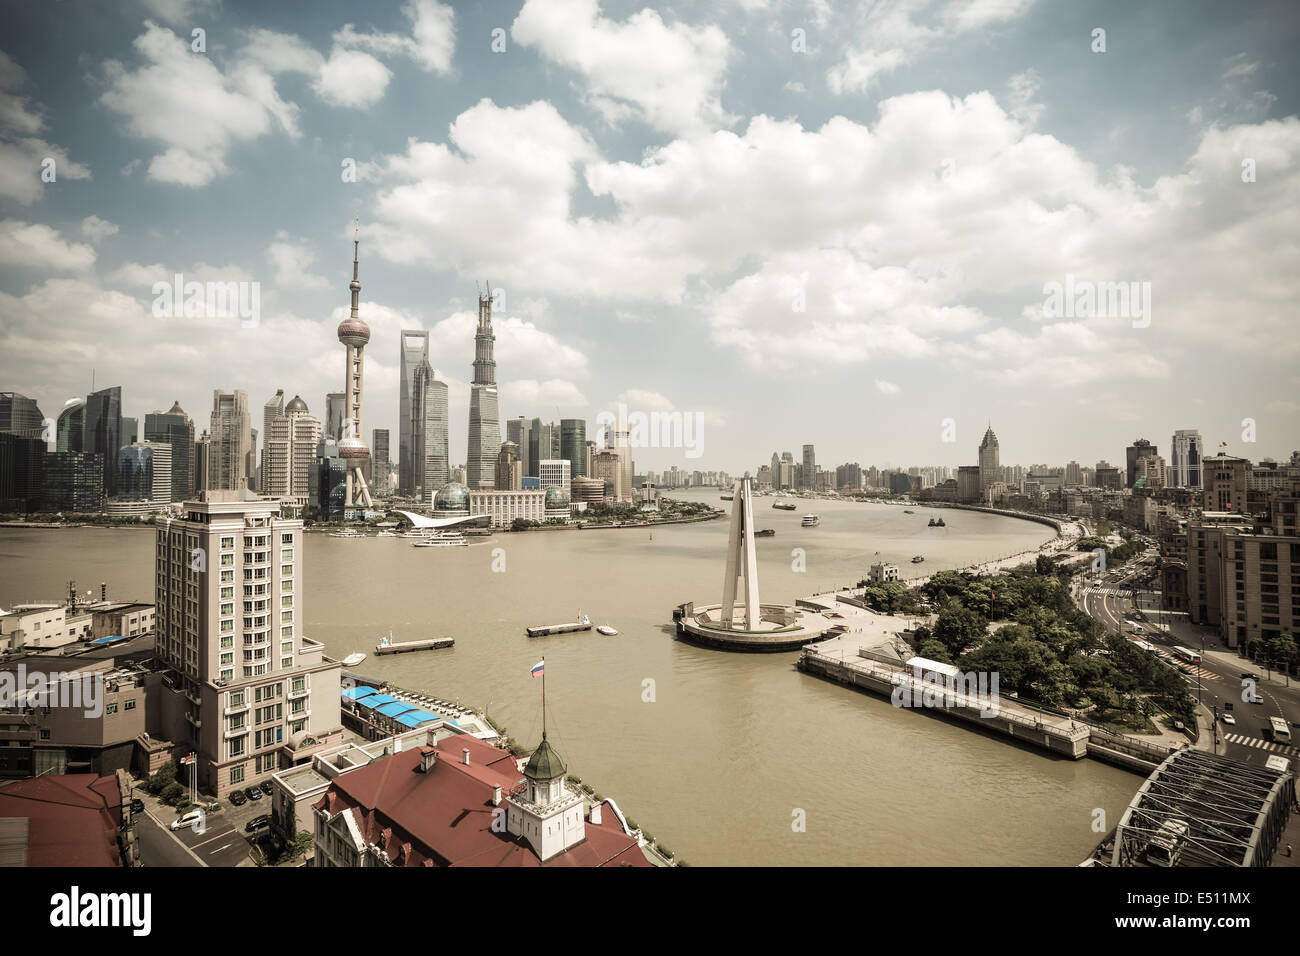 Shanghai skyline at daytime Photo Stock